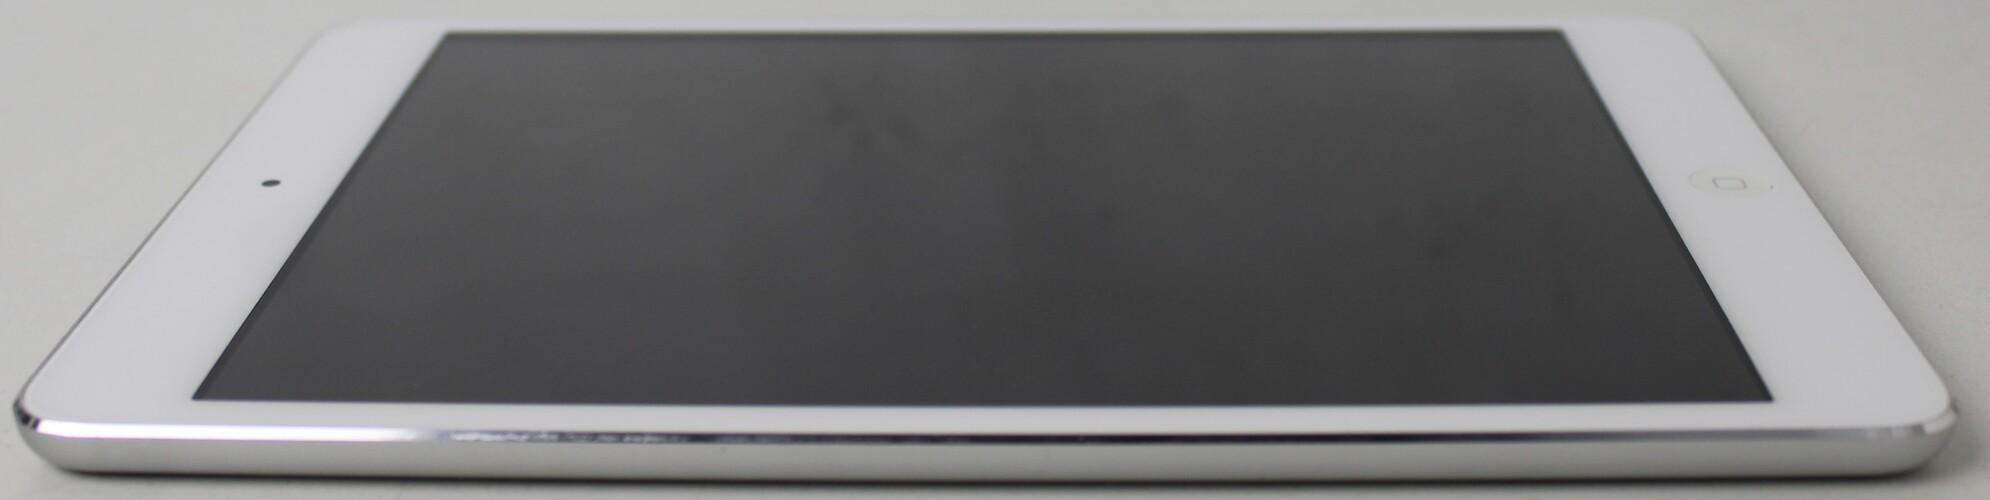 "IPAD MINI 1 MD533BZ/A 7.9"" 64GB WIFI - BRANCO"